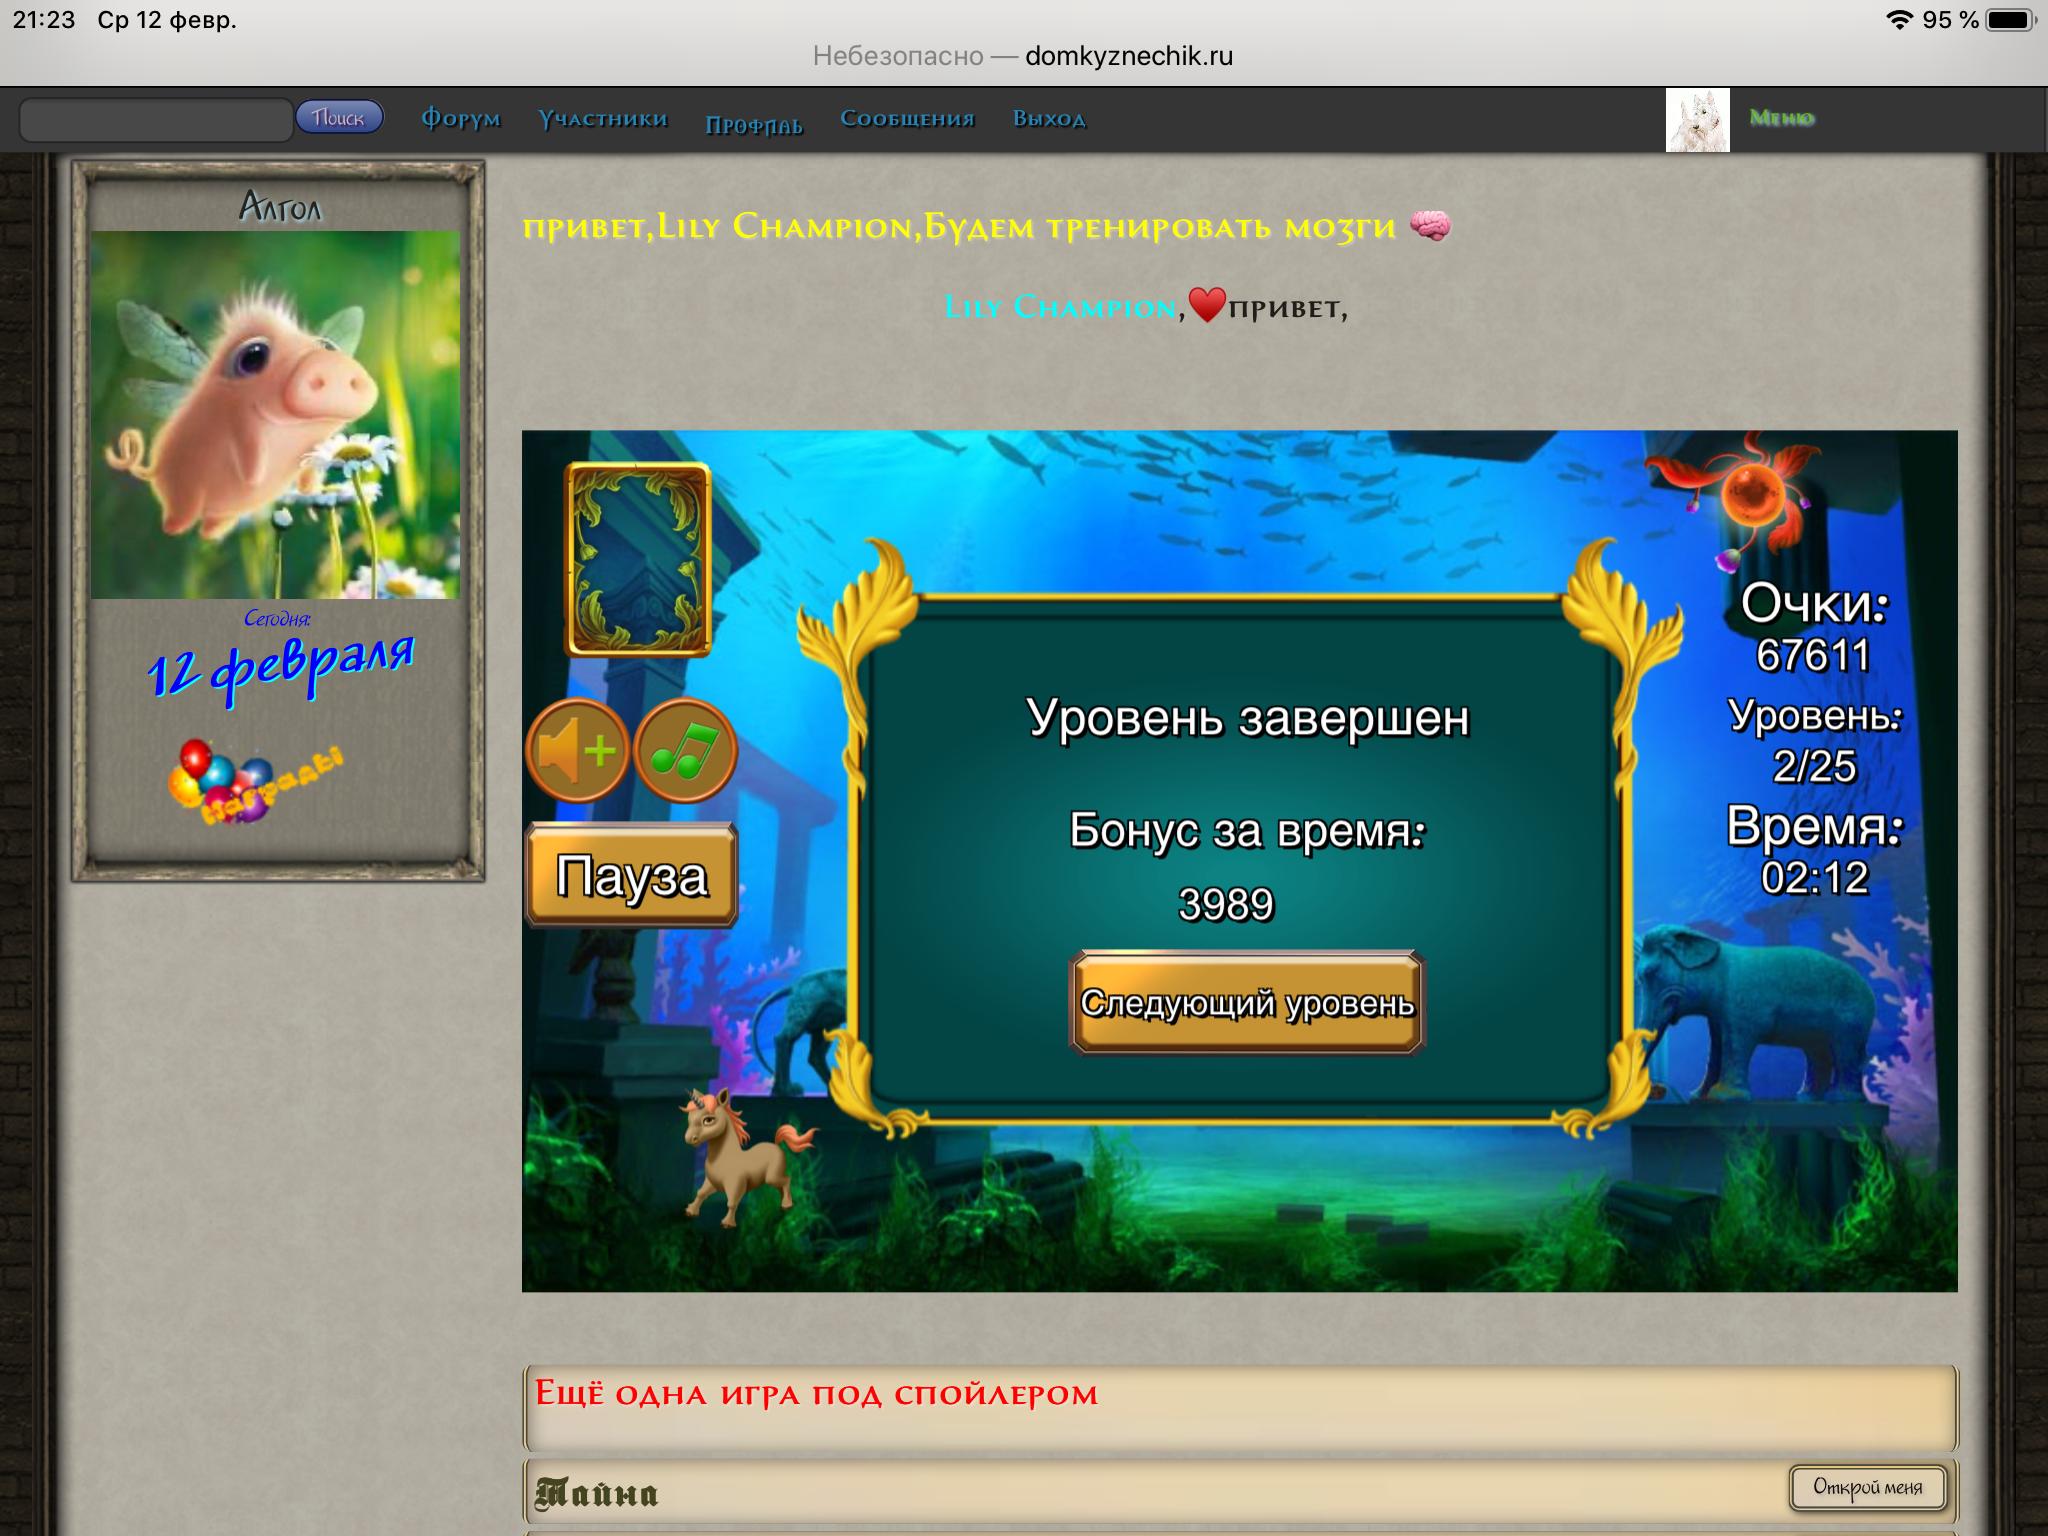 https://i4.imageban.ru/out/2020/02/12/28201a6da7132b5d521e80332763b4a5.png